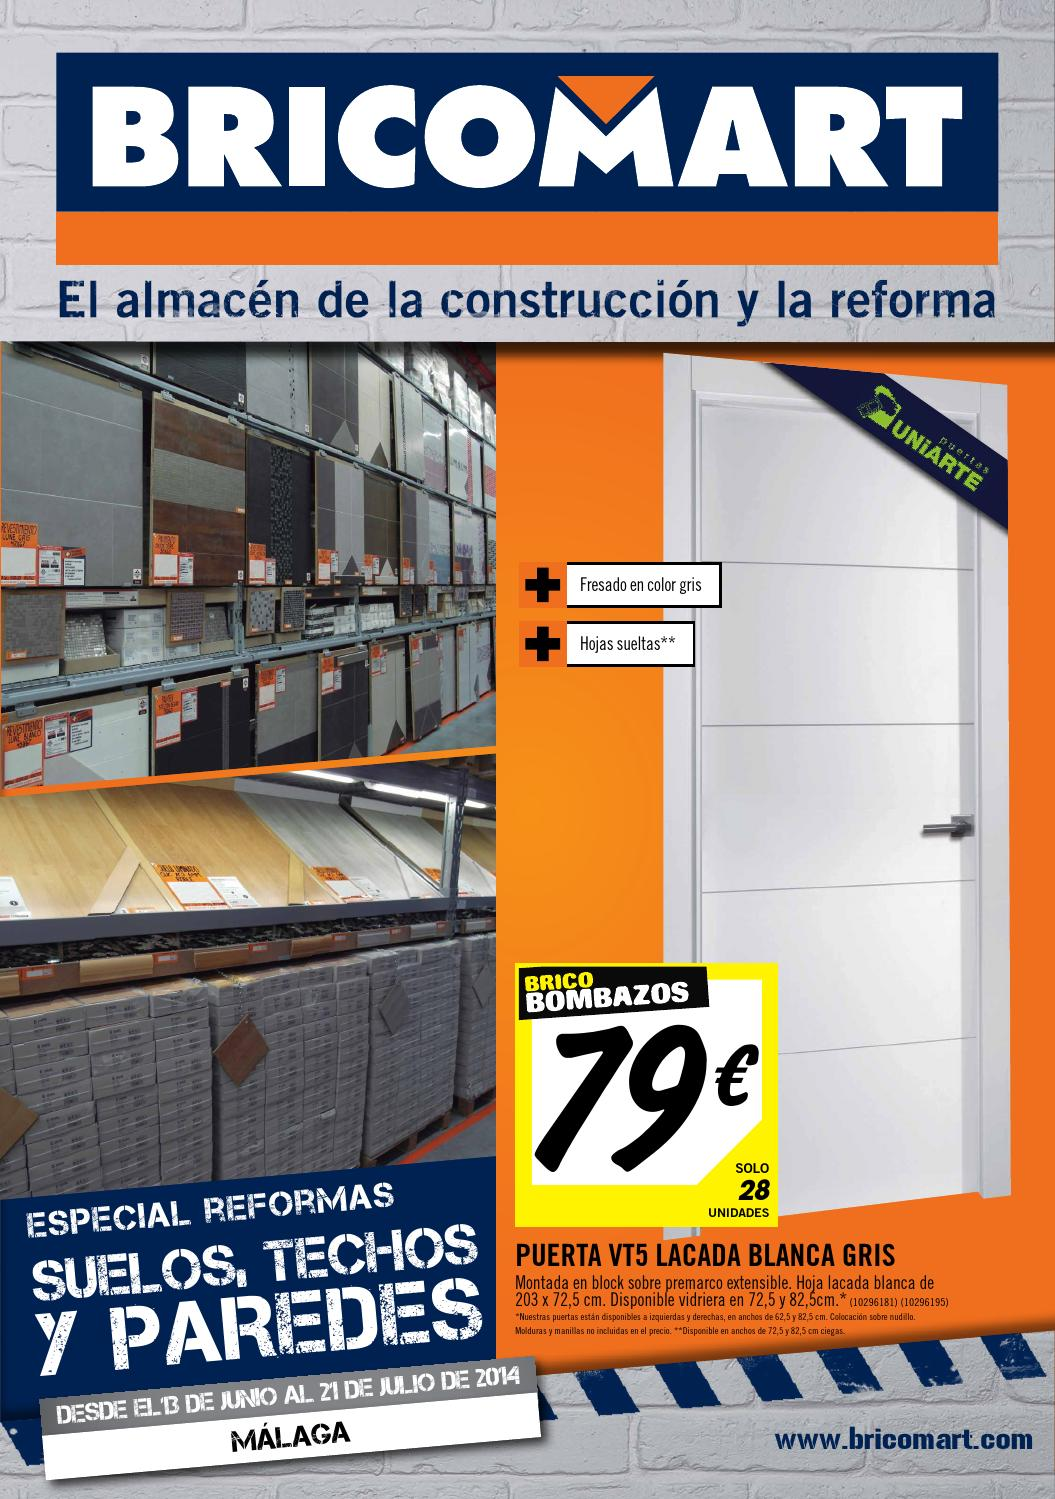 Bricomart folleto malaga malaga 09 06 2014 by for Puertas bricomart